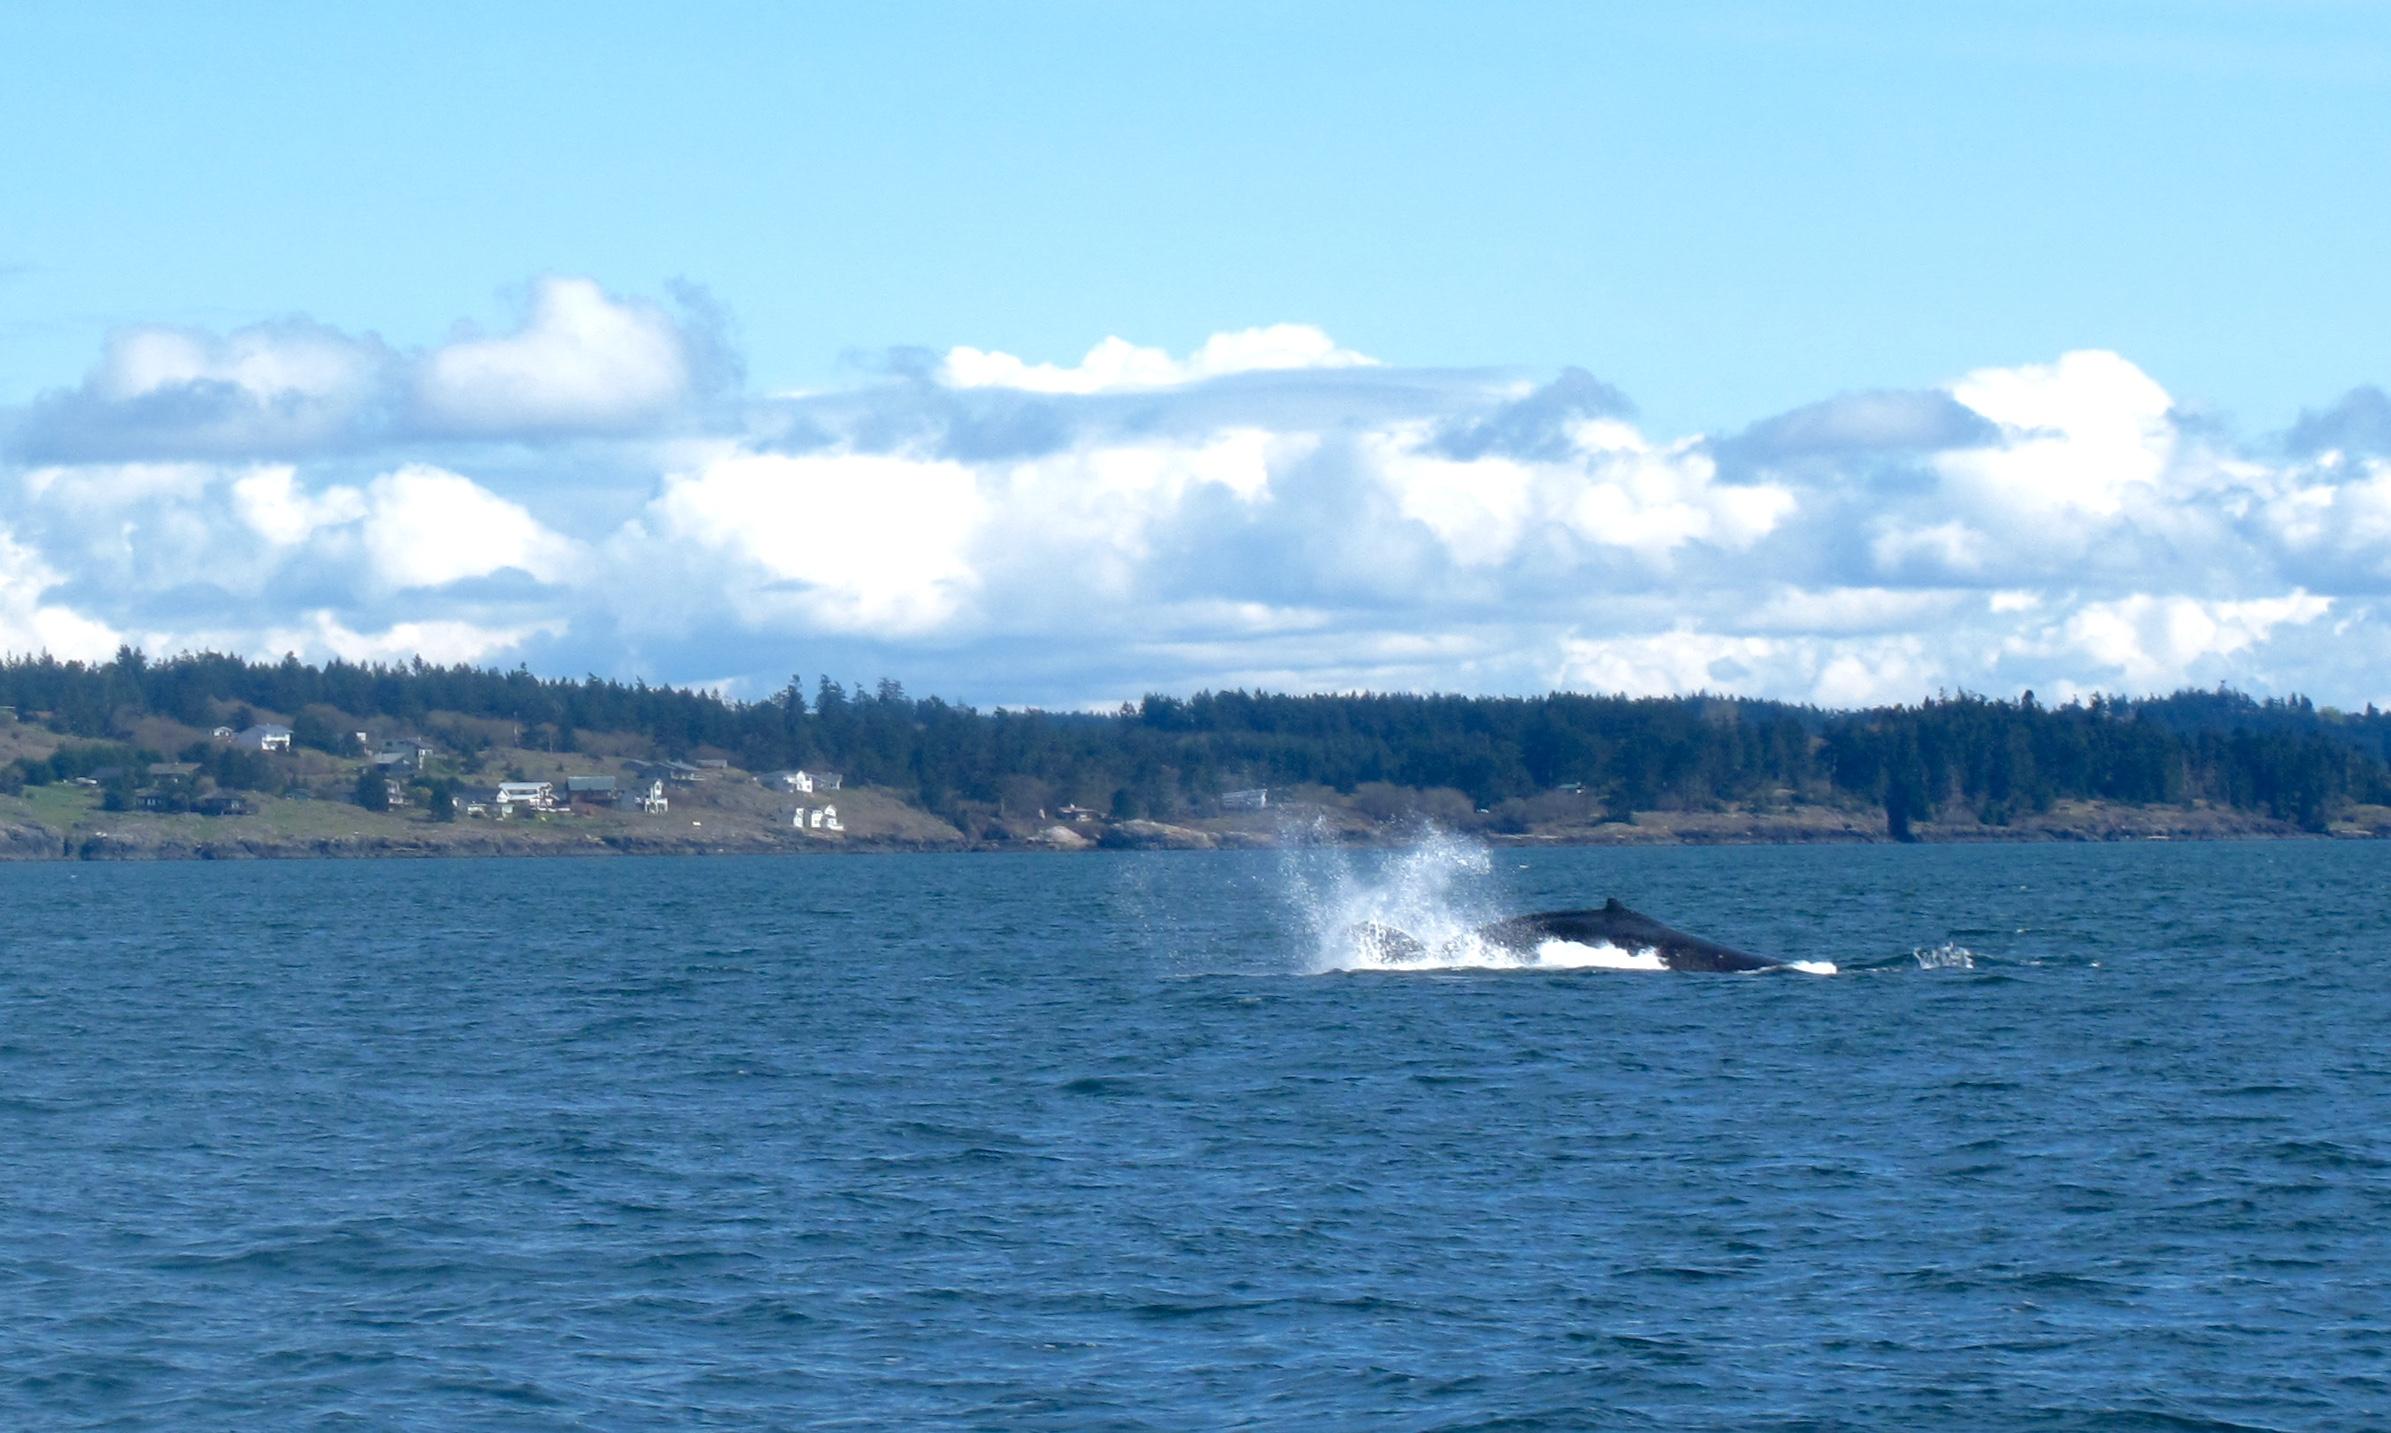 Humpback whale near the San Juan islands.